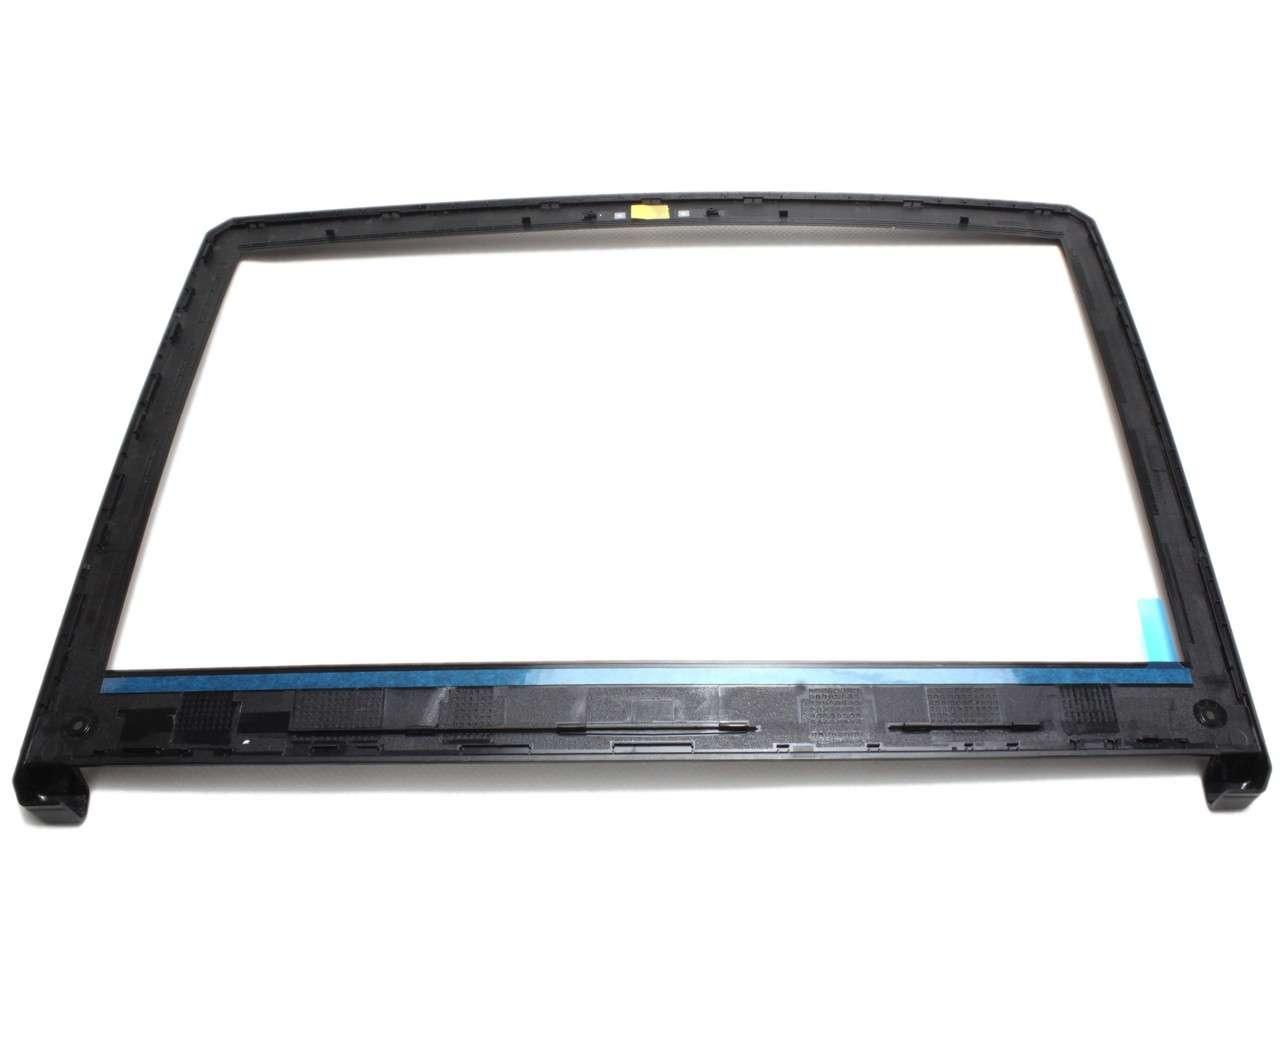 Rama Display Asus FX504GD Bezel Front Cover Neagra imagine powerlaptop.ro 2021